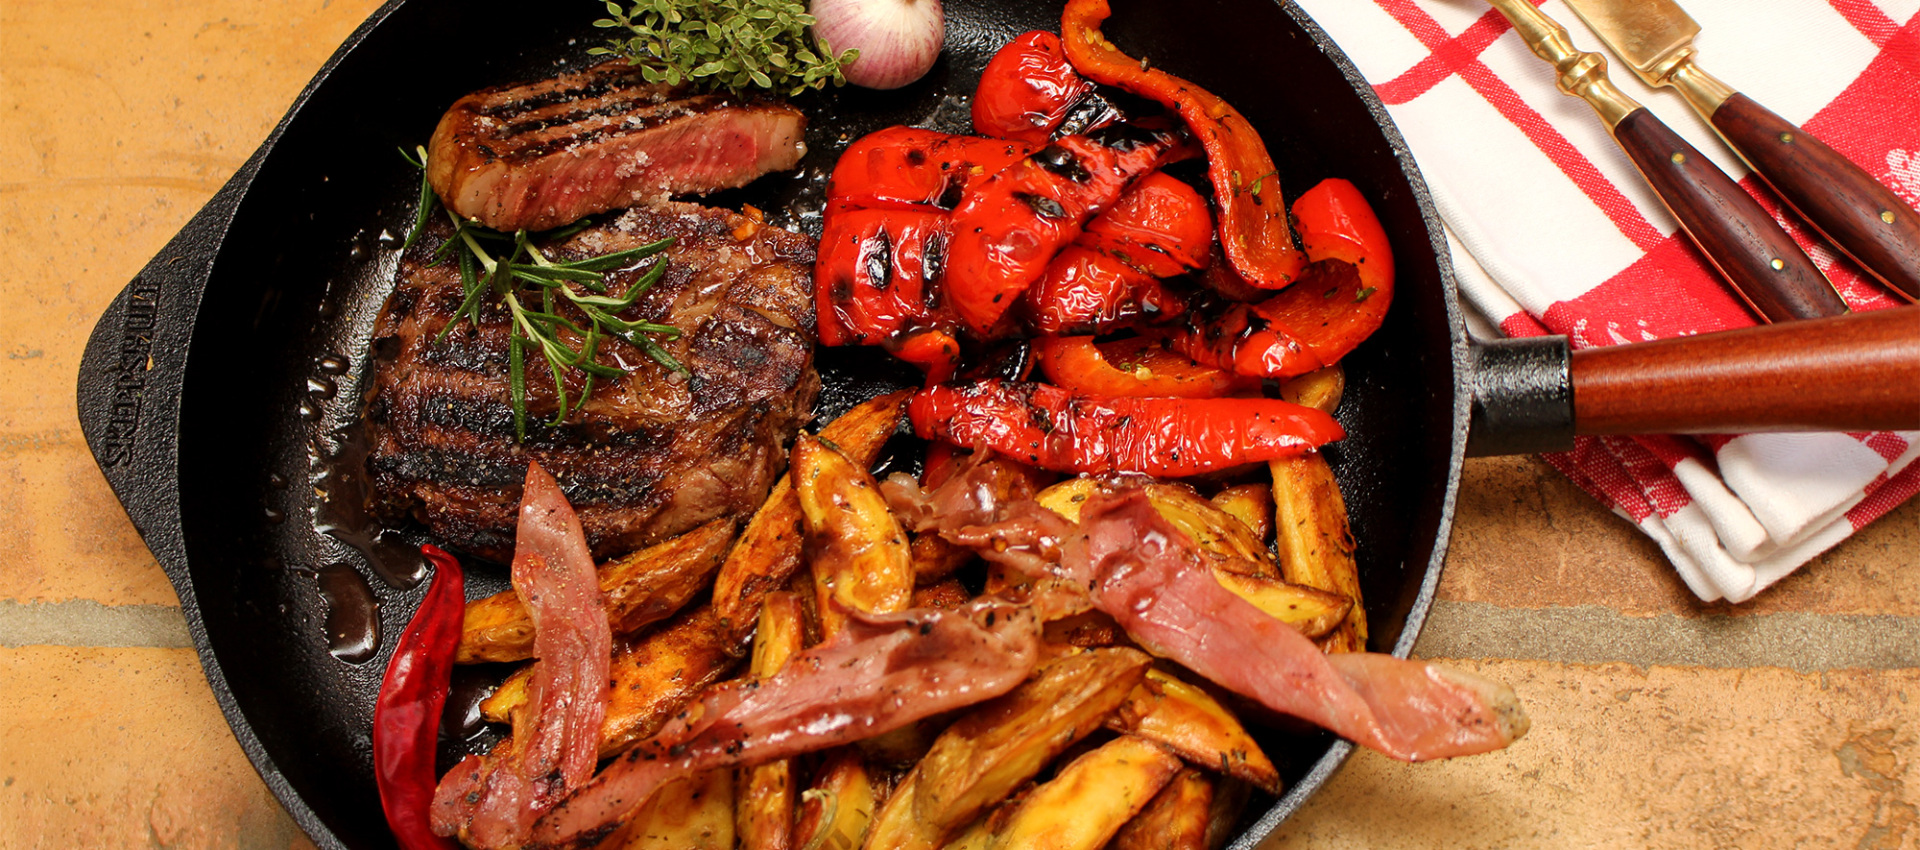 Rezept American Ribeye Steak Wagyu Kobe Style mit Rosmarin Wedges & gegrillten Paprikas - Kochbock.de